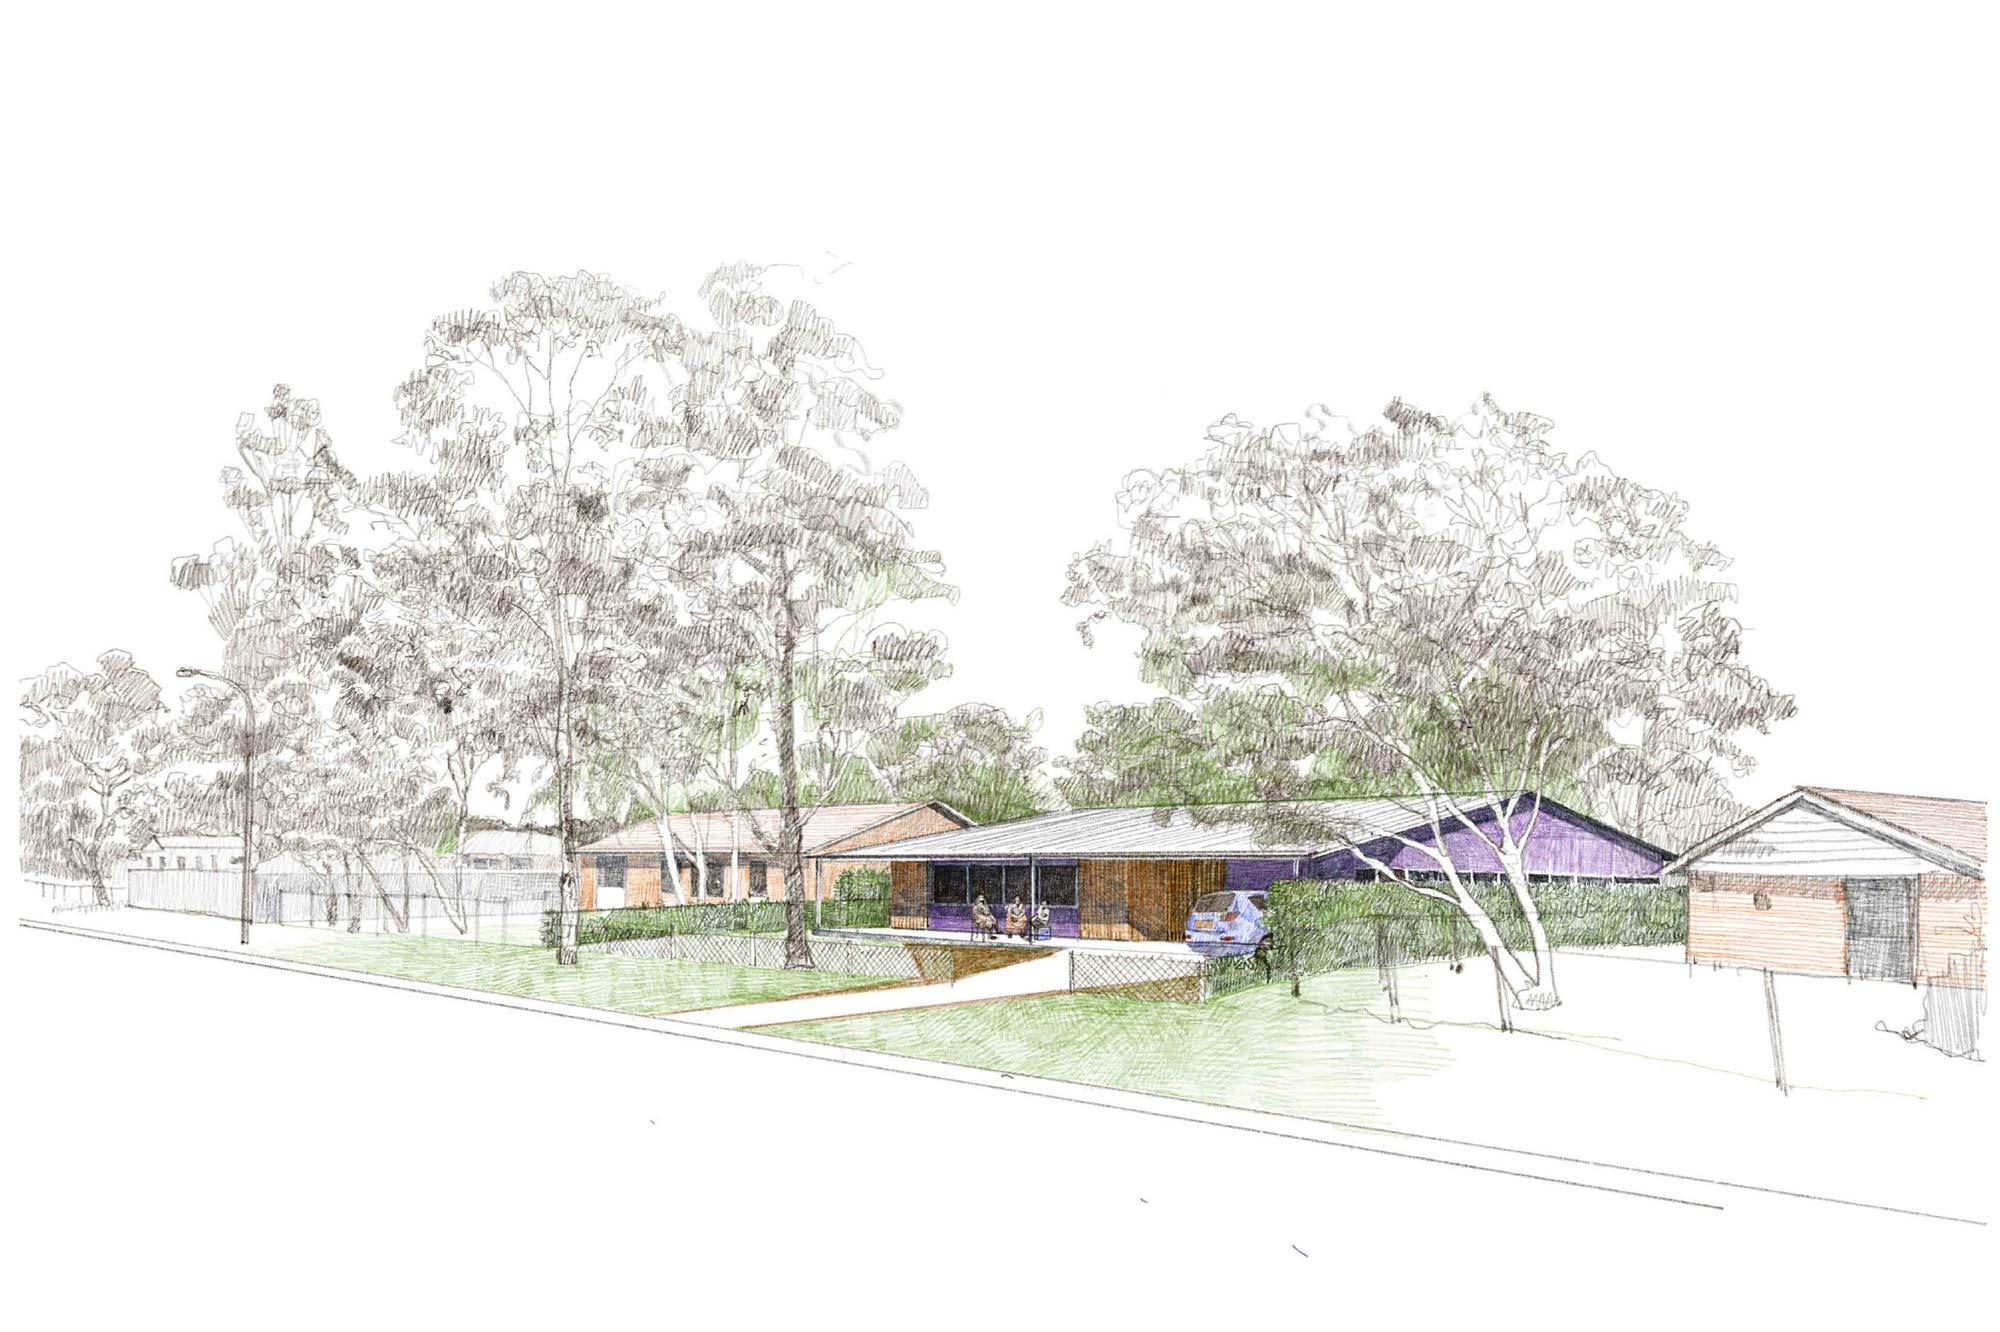 aboriginal-housing-2.jpg